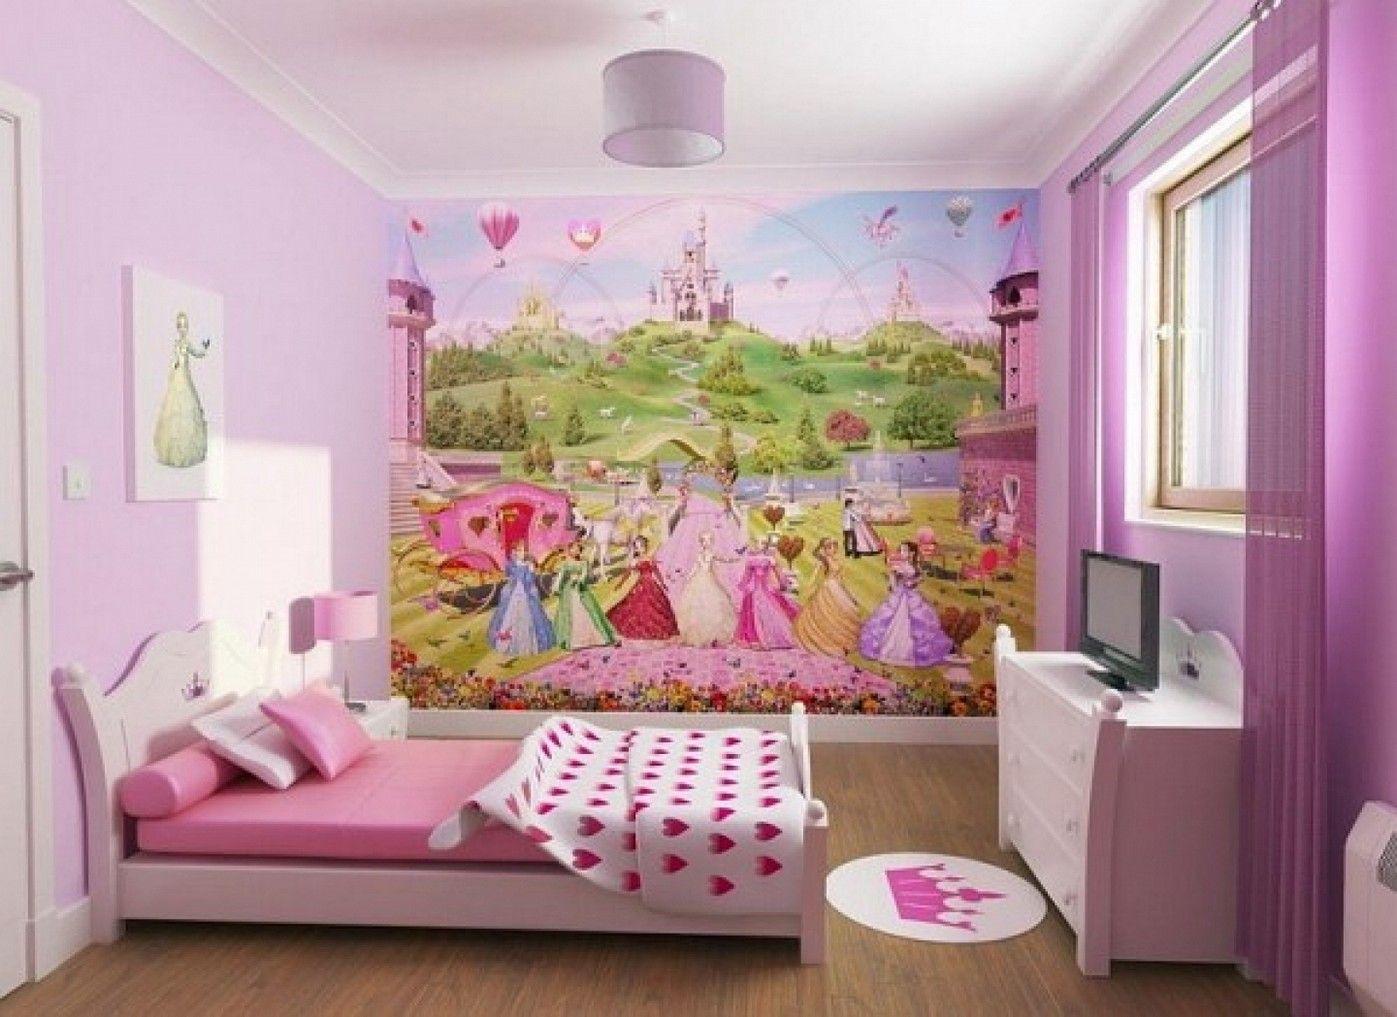 Gossip Girl Room Decor Butterflies, Girl Room Themes For Tweens, Teenage Girl  Room Decor